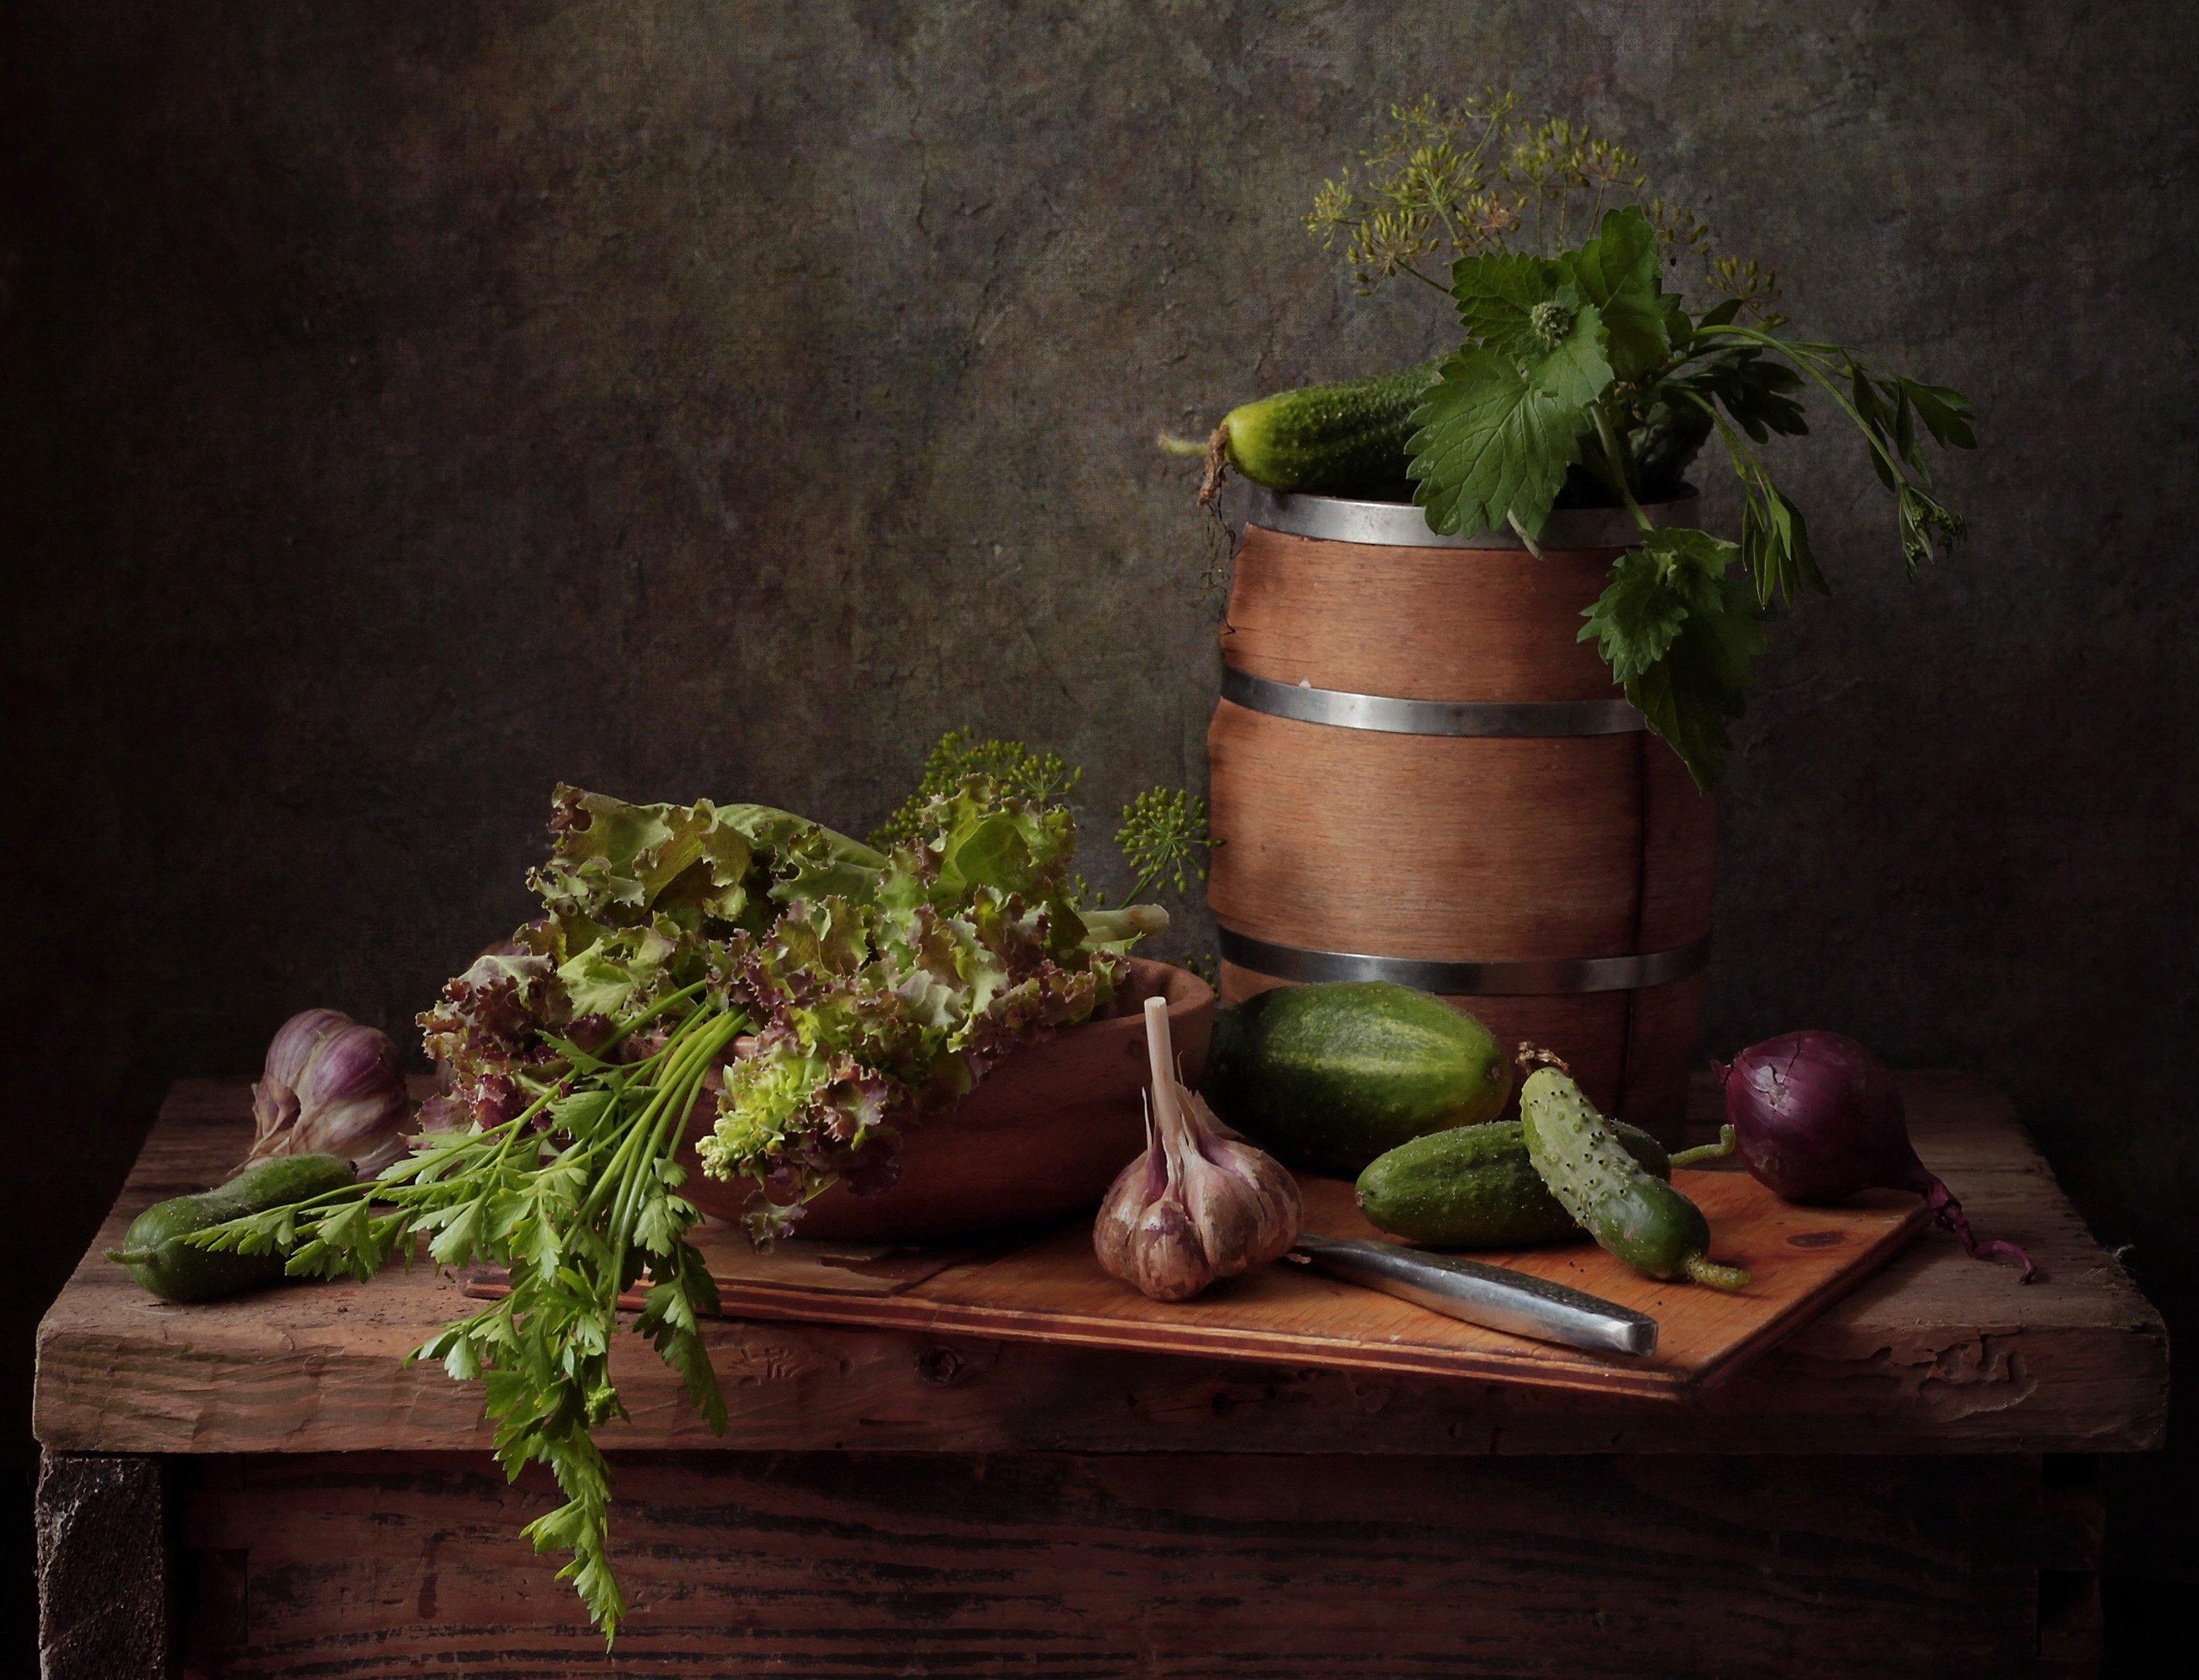 натюрморт, овощи, салат, огурец, Рябикова-Багузова Галина